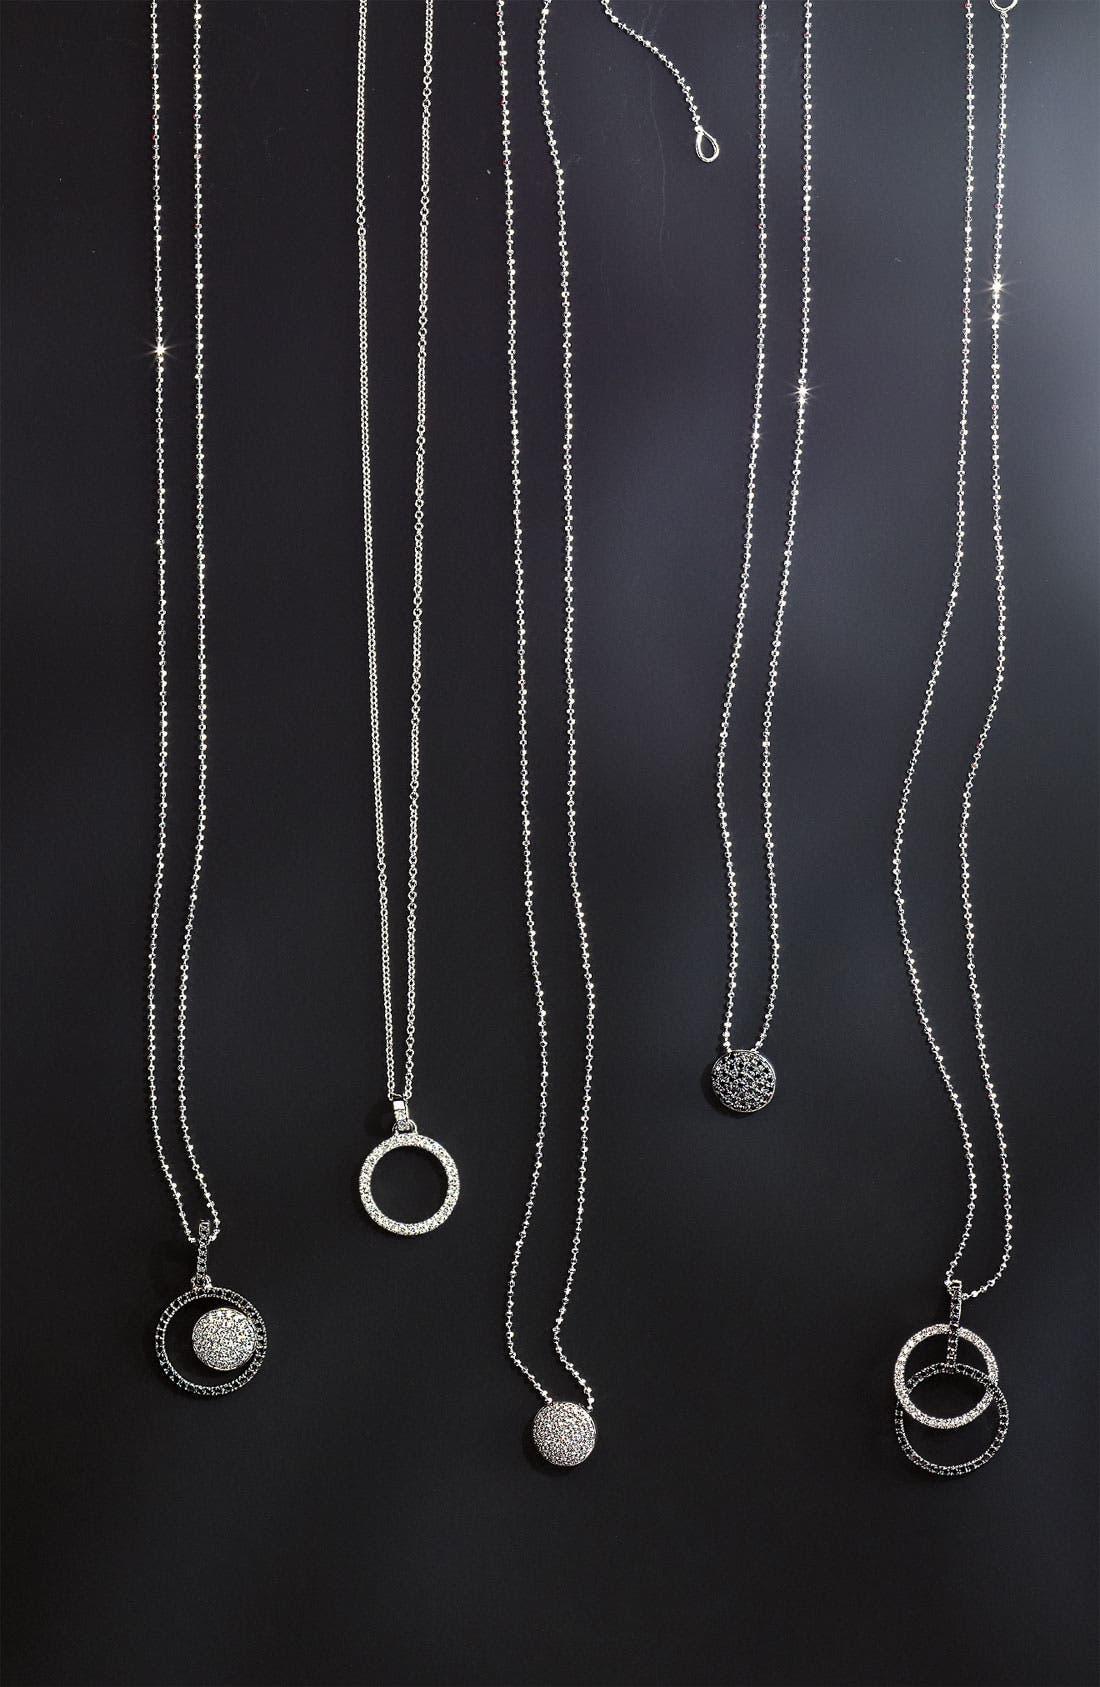 Alternate Image 2  - Bony Levy 'Eclipse' Open Circle Diamond Pendant Necklace (Nordstrom Exclusive)